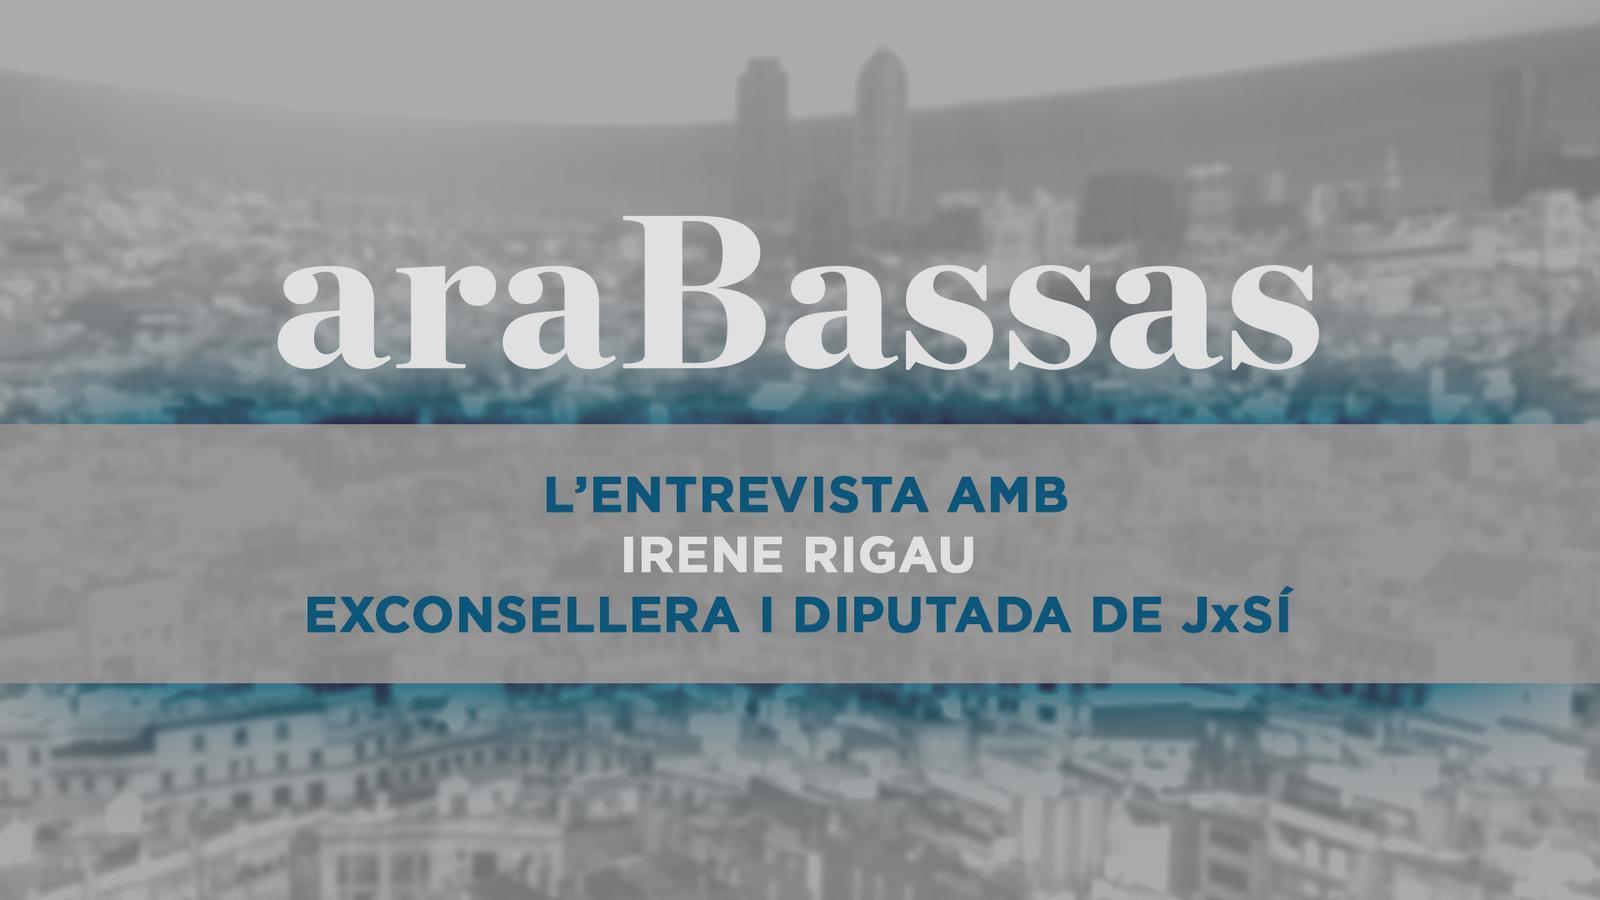 Entrevista d'Antoni Bassas a Irene Rigau